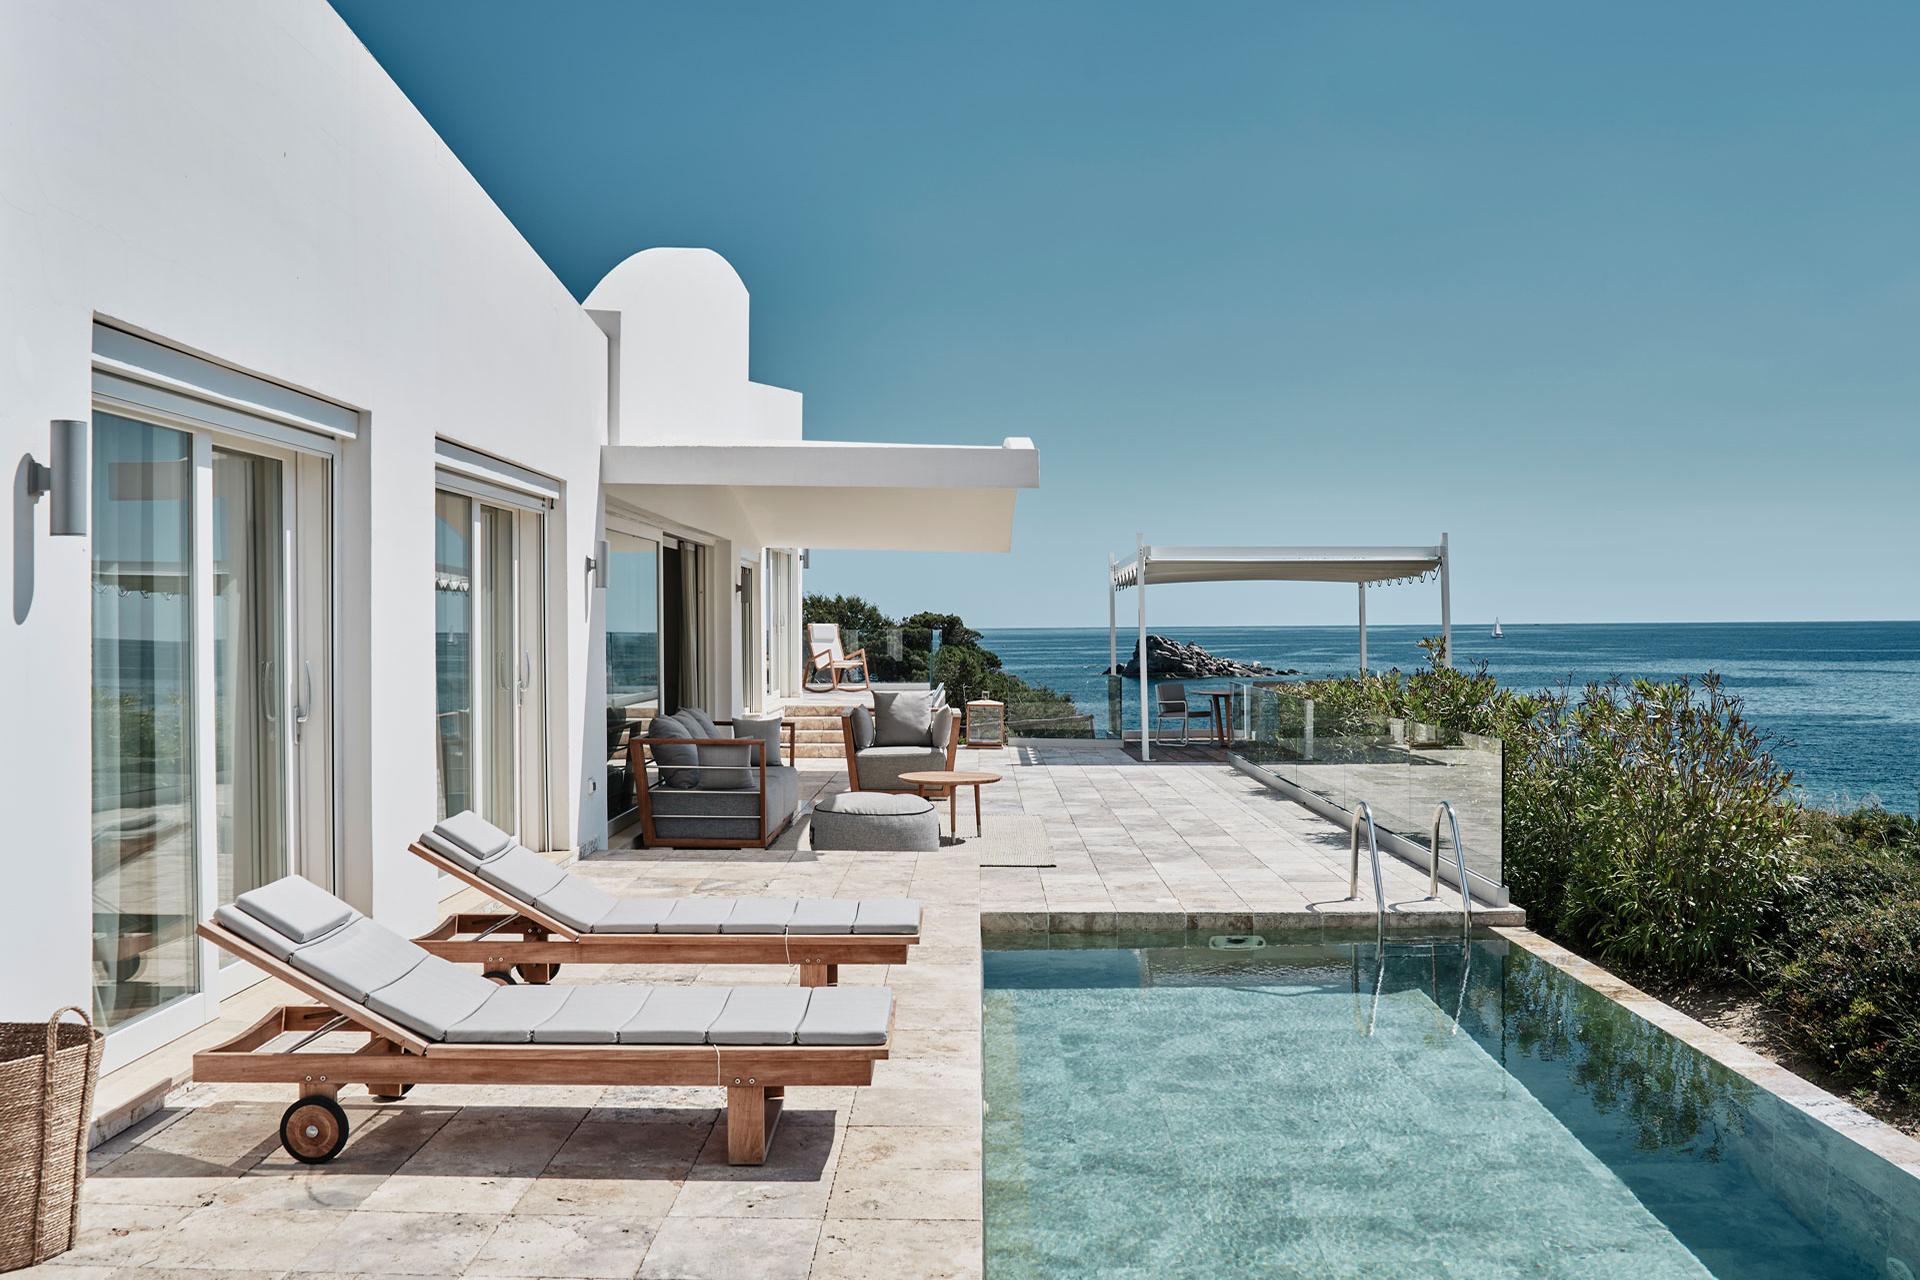 Villa Bellavista, Sardinia